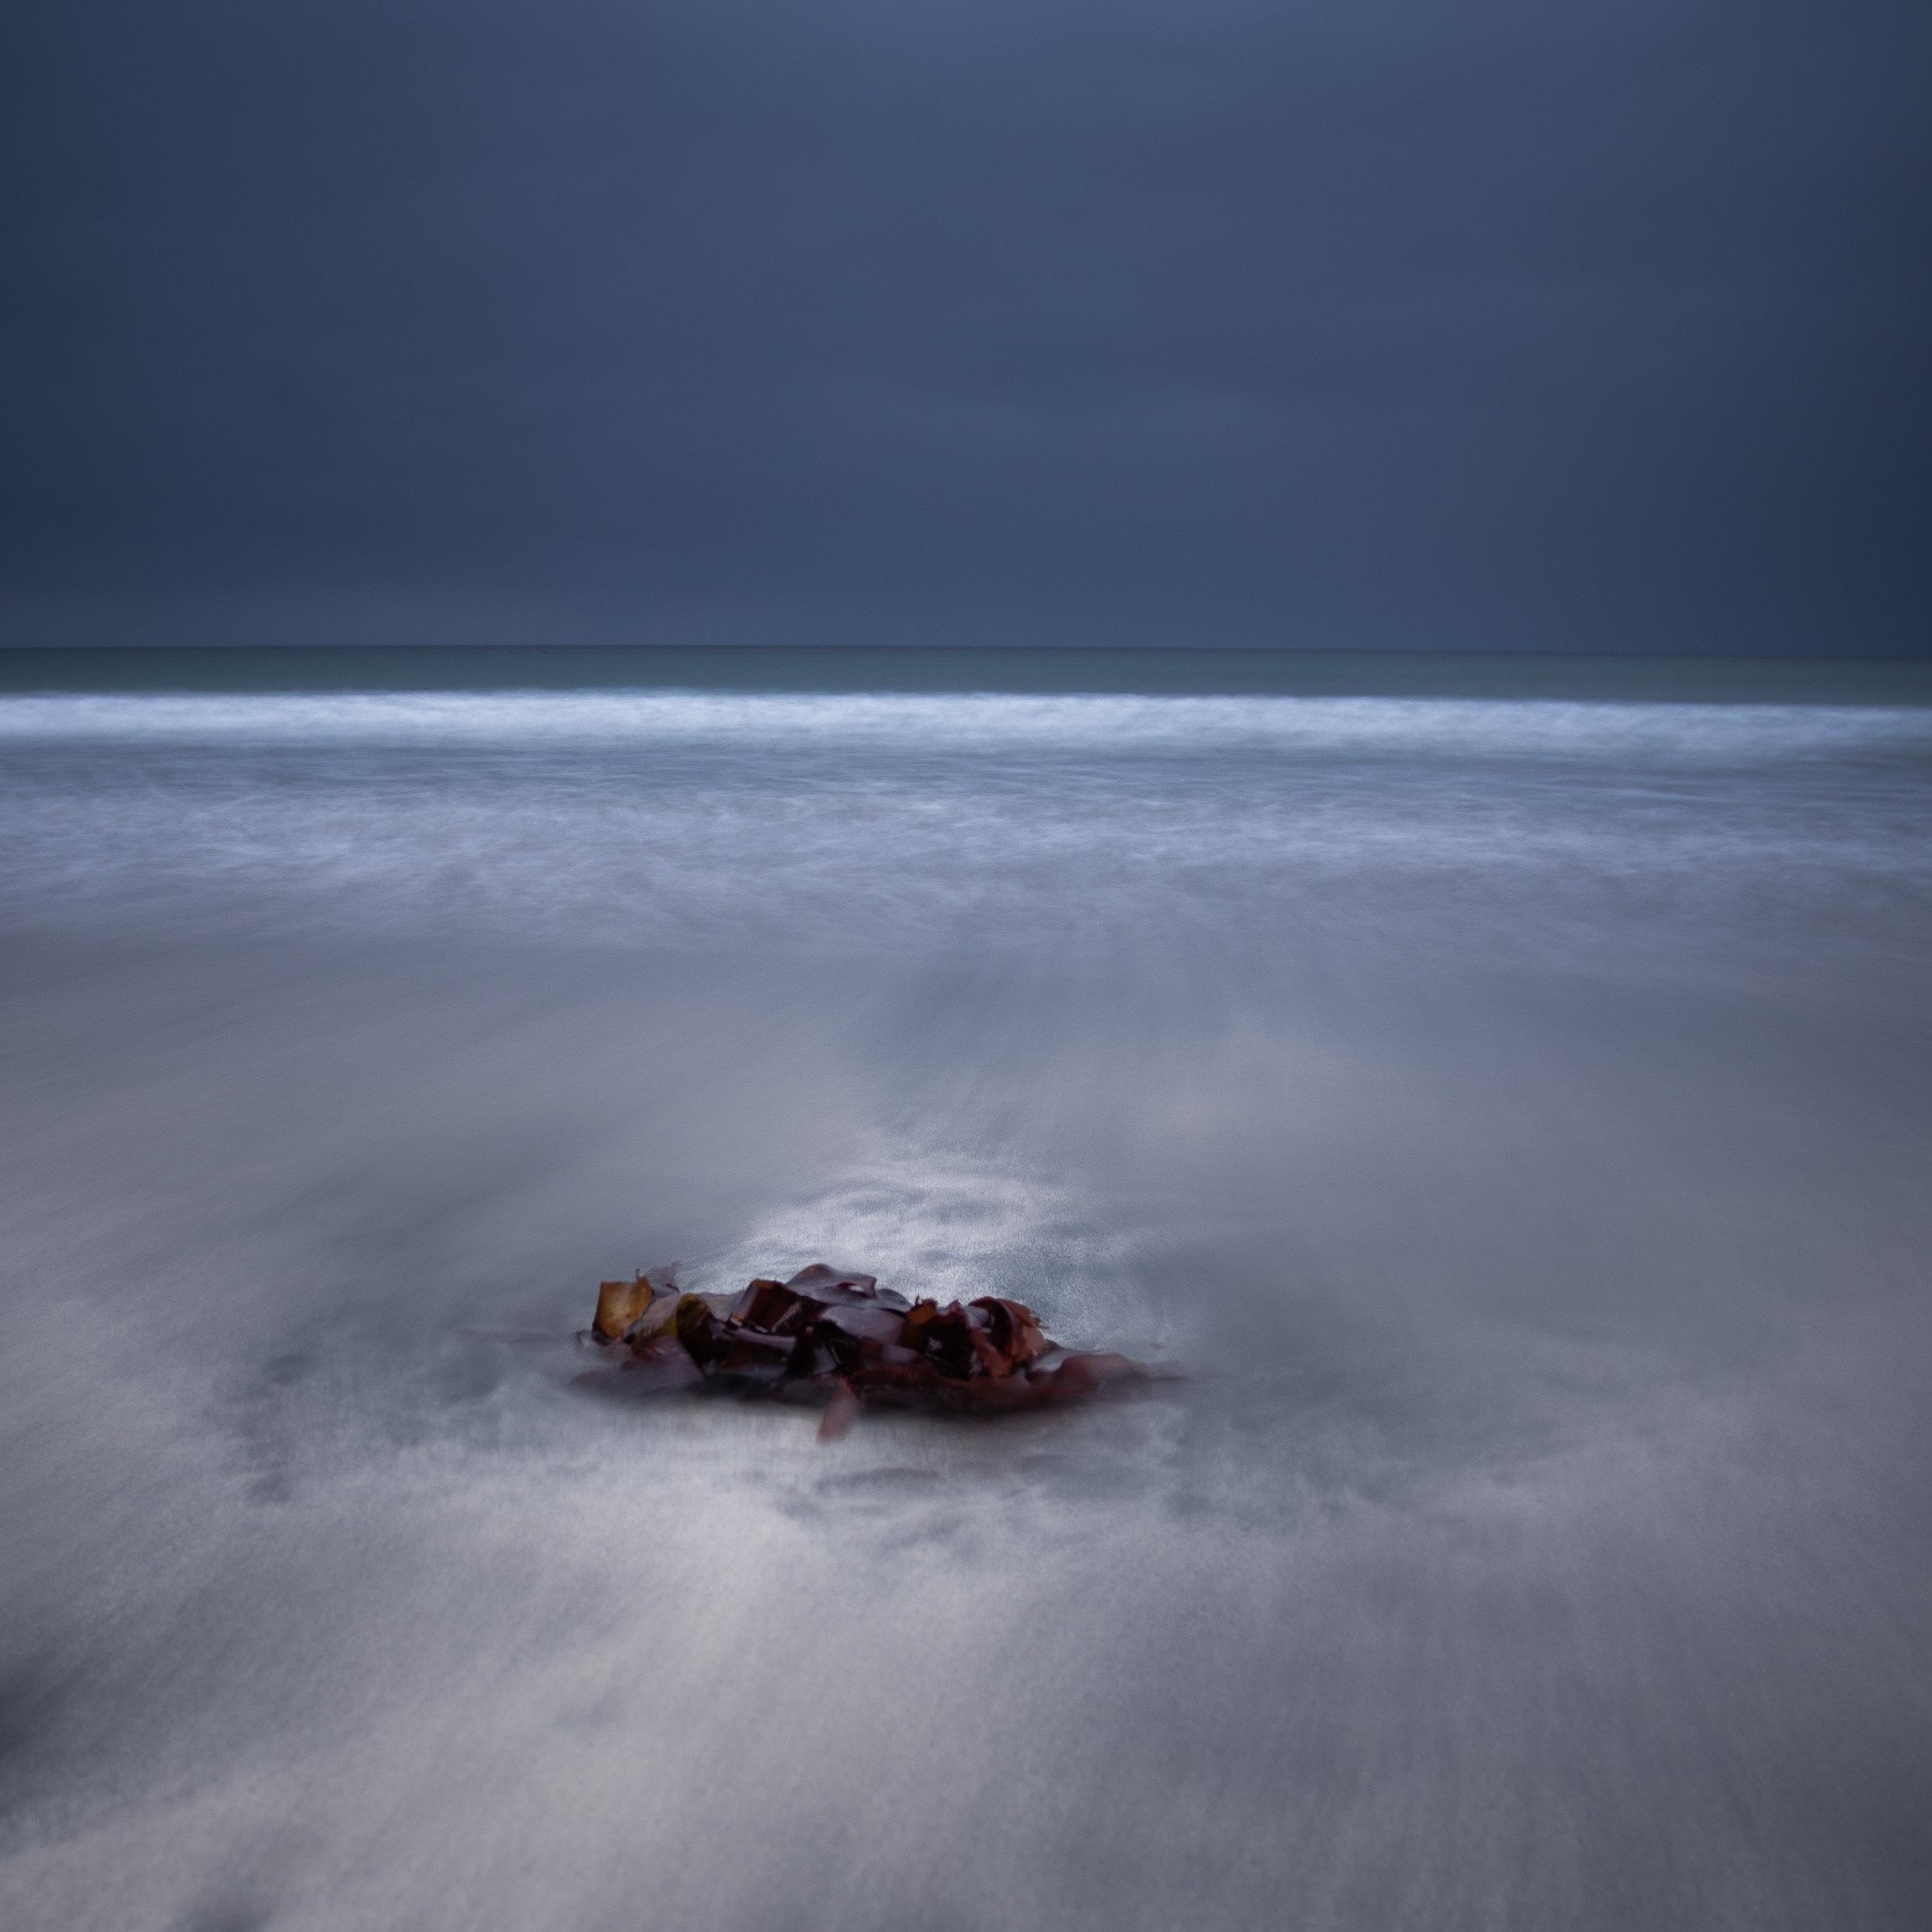 Receding Tide by Andy Clark